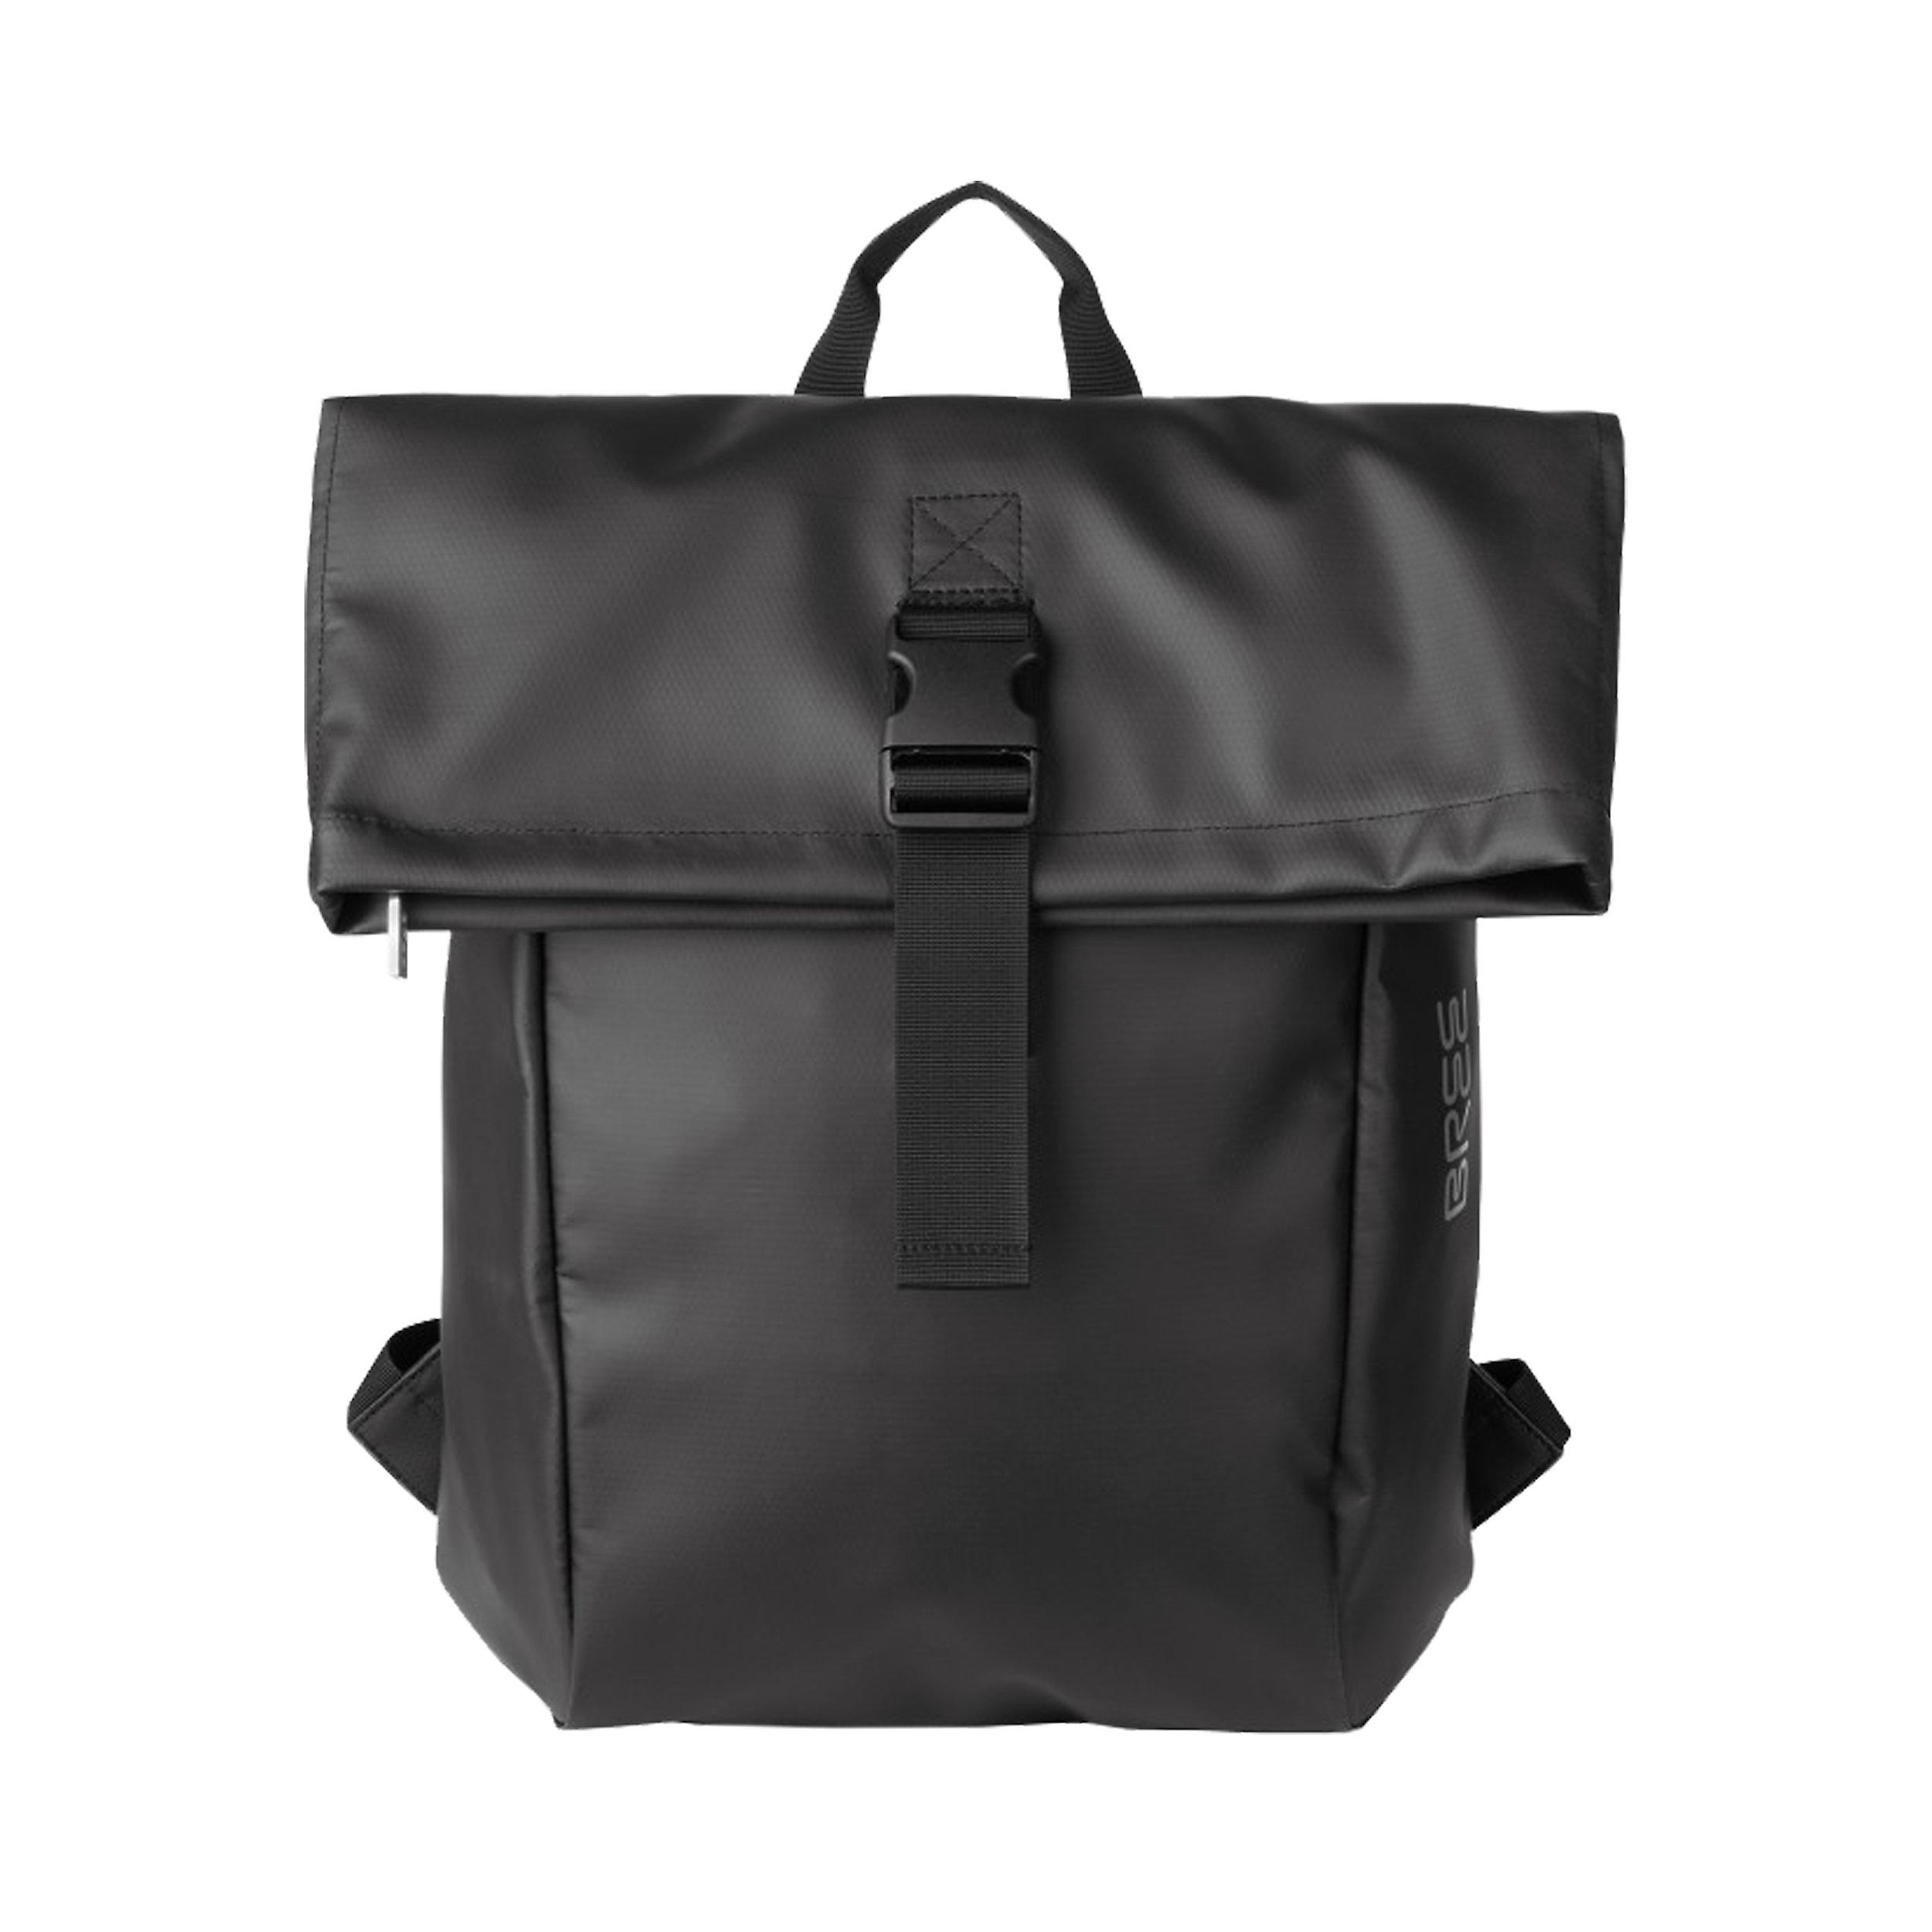 Backpack Punch 92 Punch 18 Liter